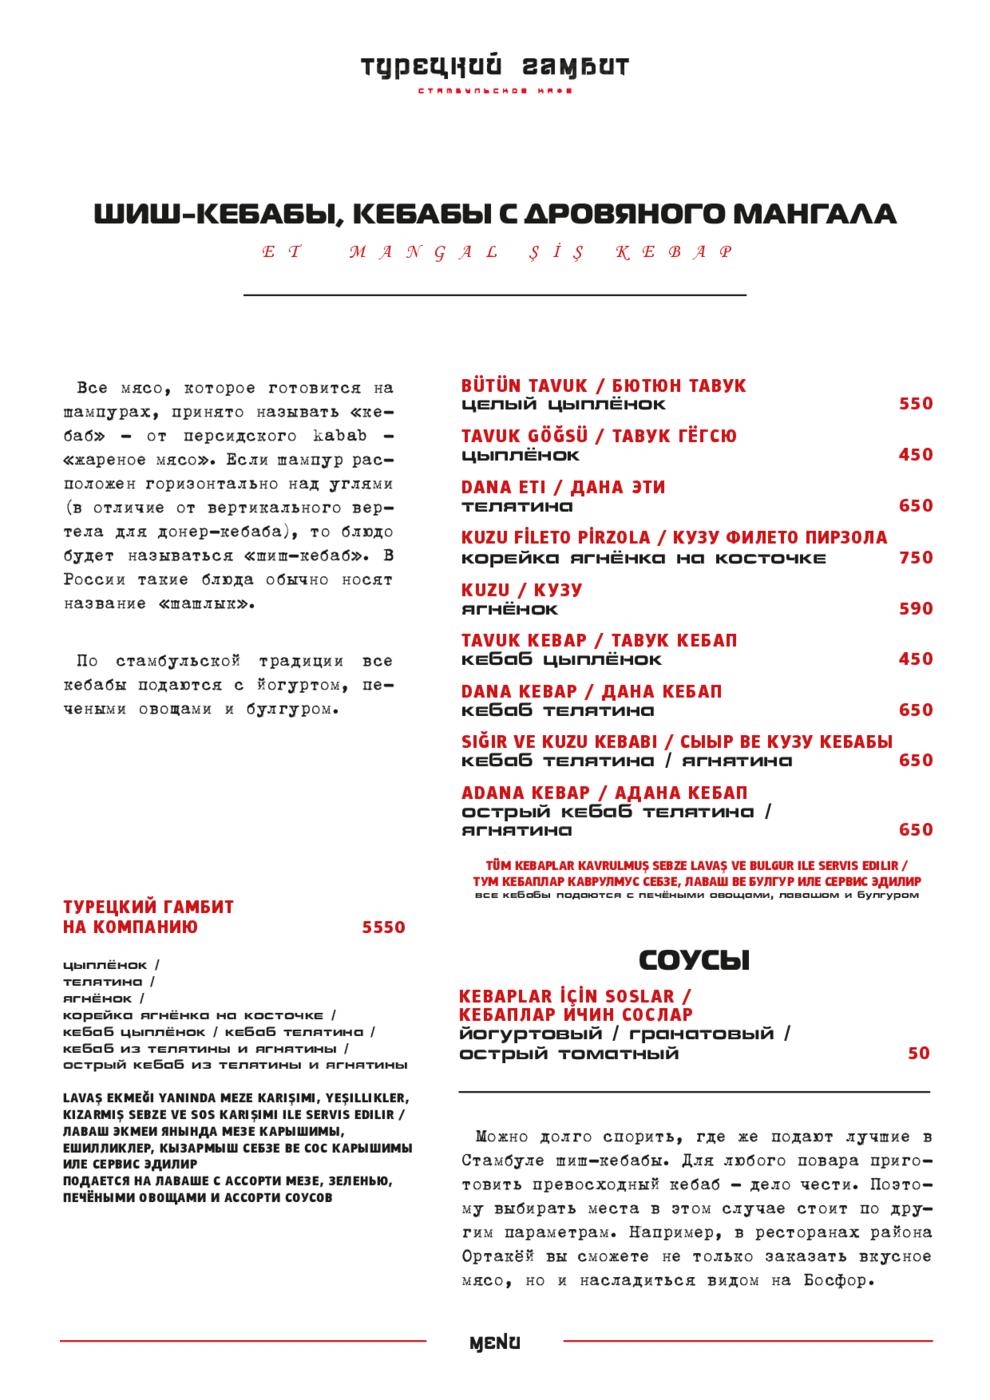 Меню кафе, ресторана Турецкий Гамбит на Кутузовском проспекте